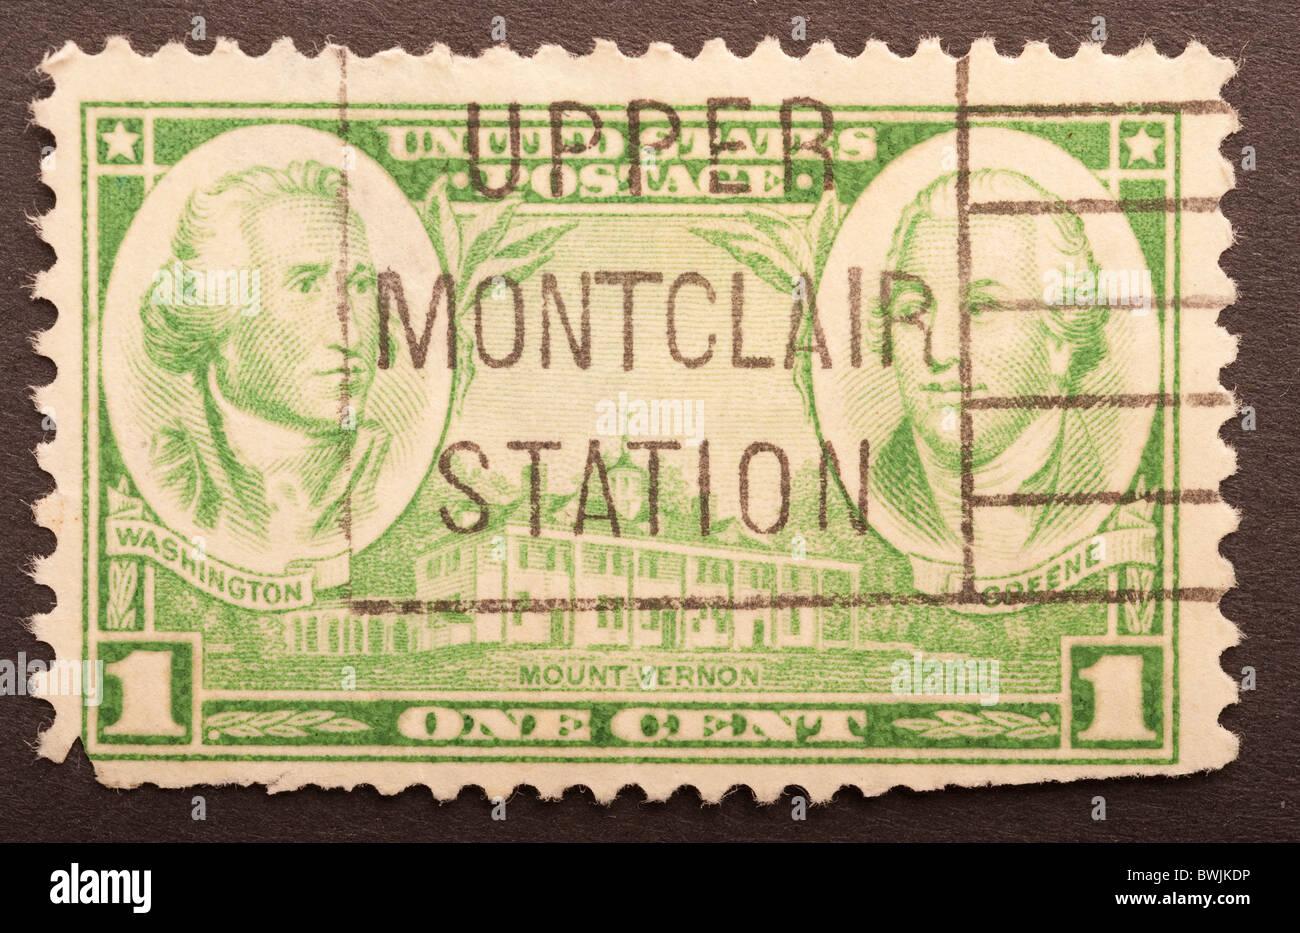 United States Postage 1 Cent